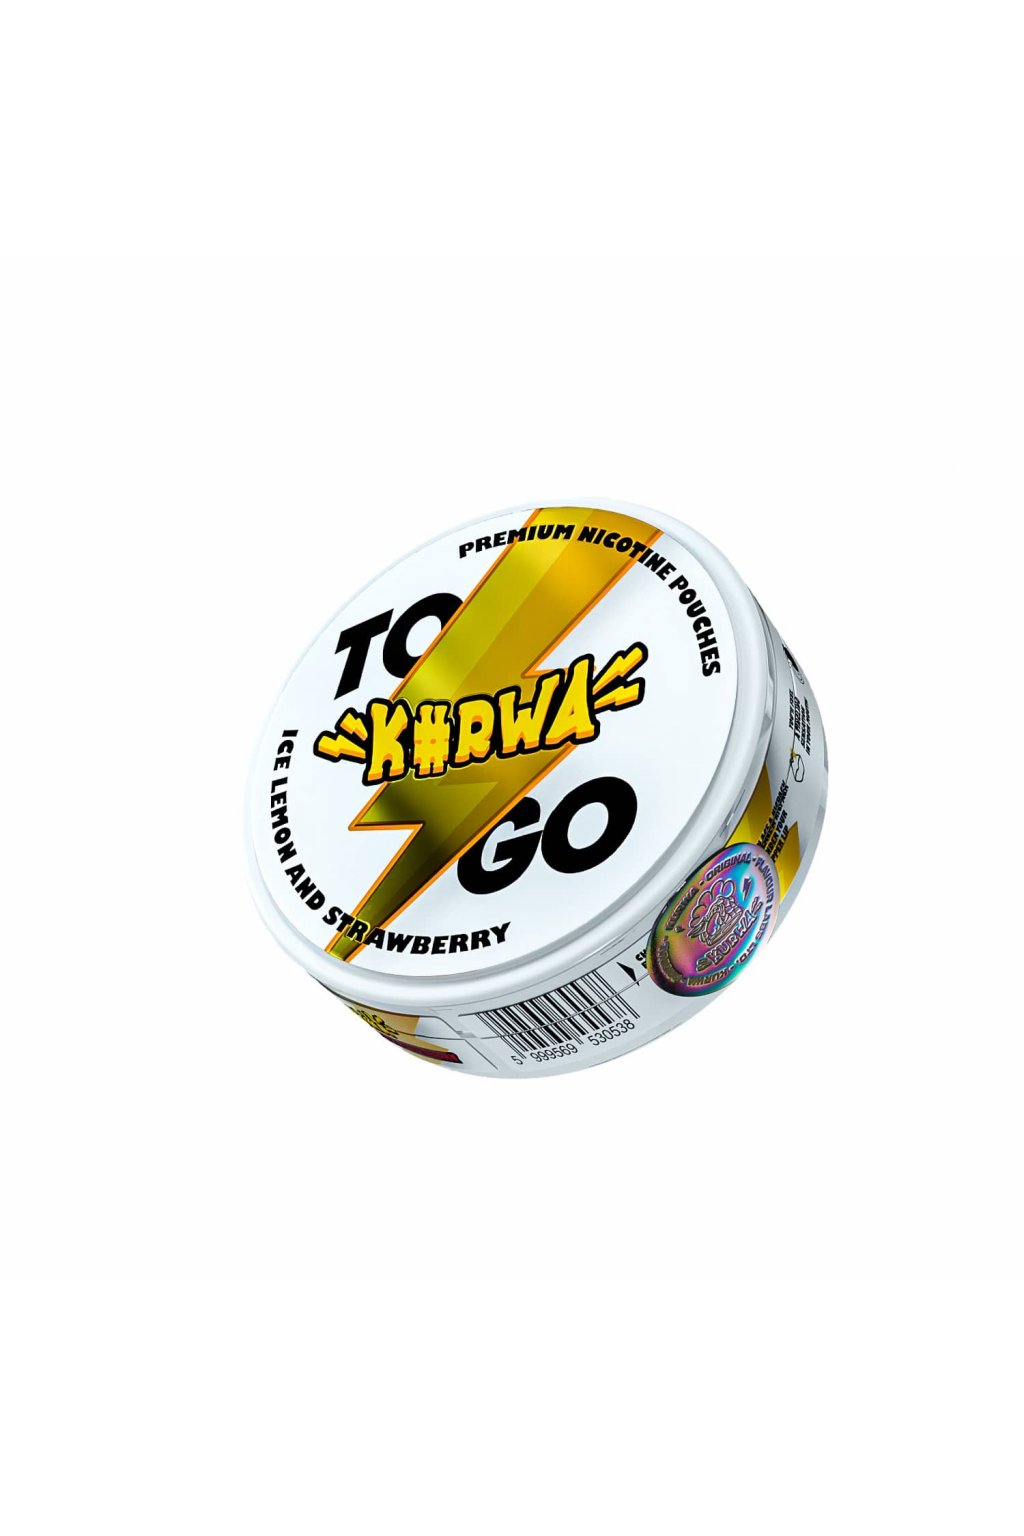 kuraw to go ice lemon and strawberry nikotinove sacky